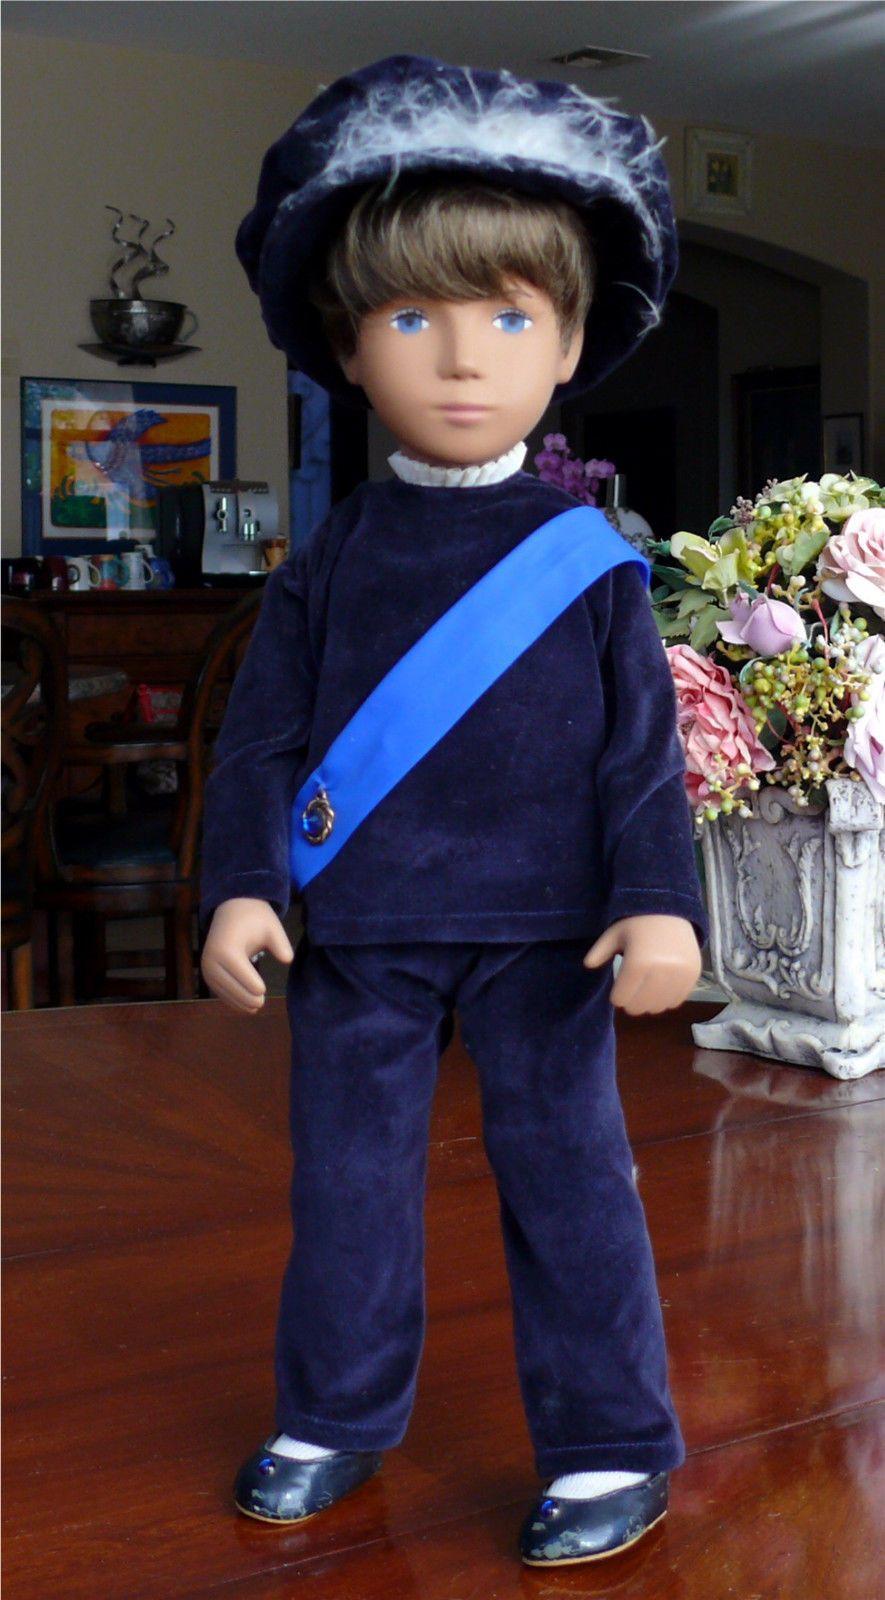 Vintage Limited Ed. Sasha Prince Gregor Boy Doll #185A |  | eBay!